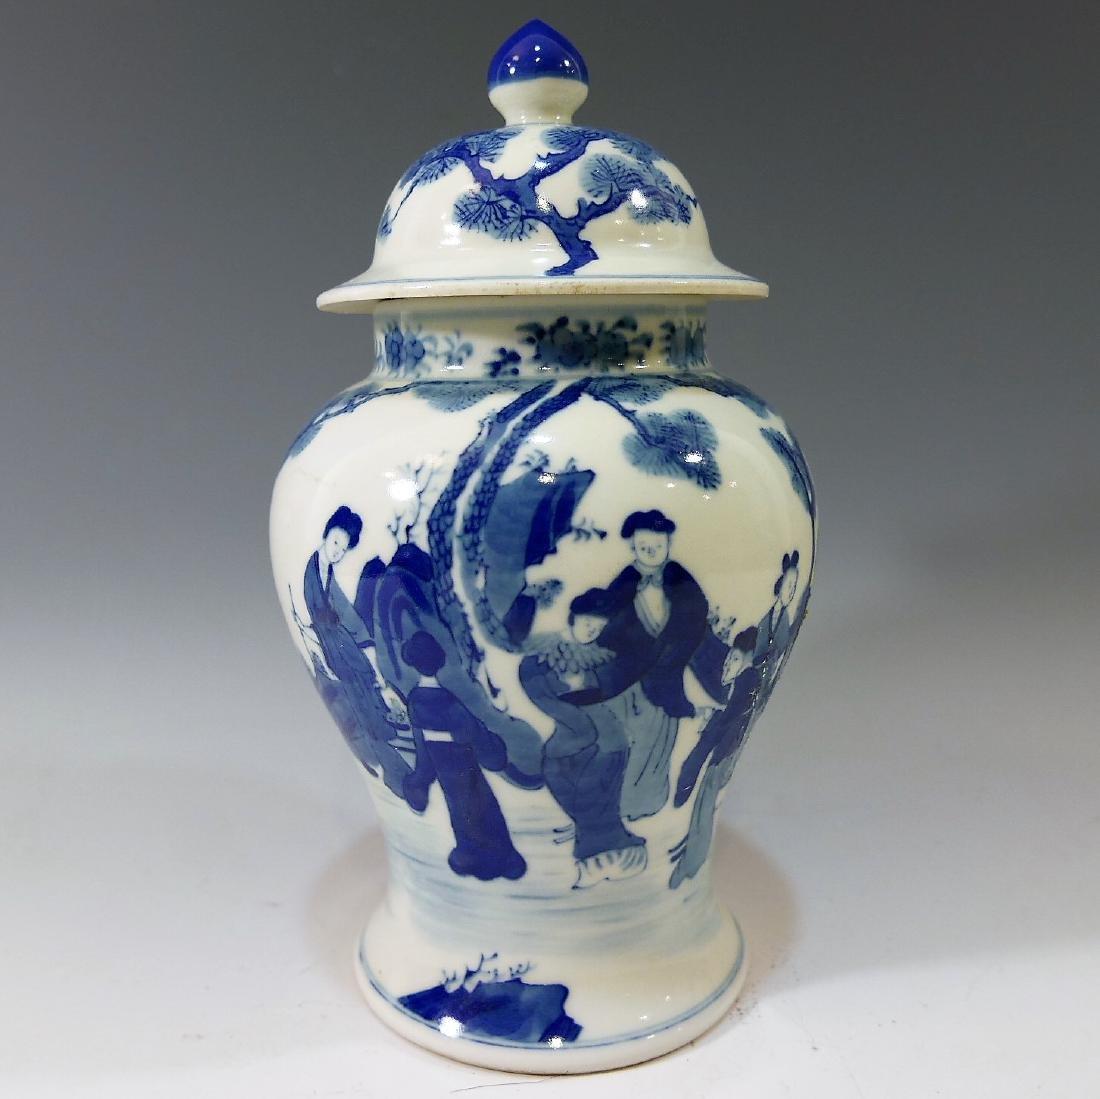 CHINESE ANTIQUE BLUE WHITE PORCELAIN COVER VASE -